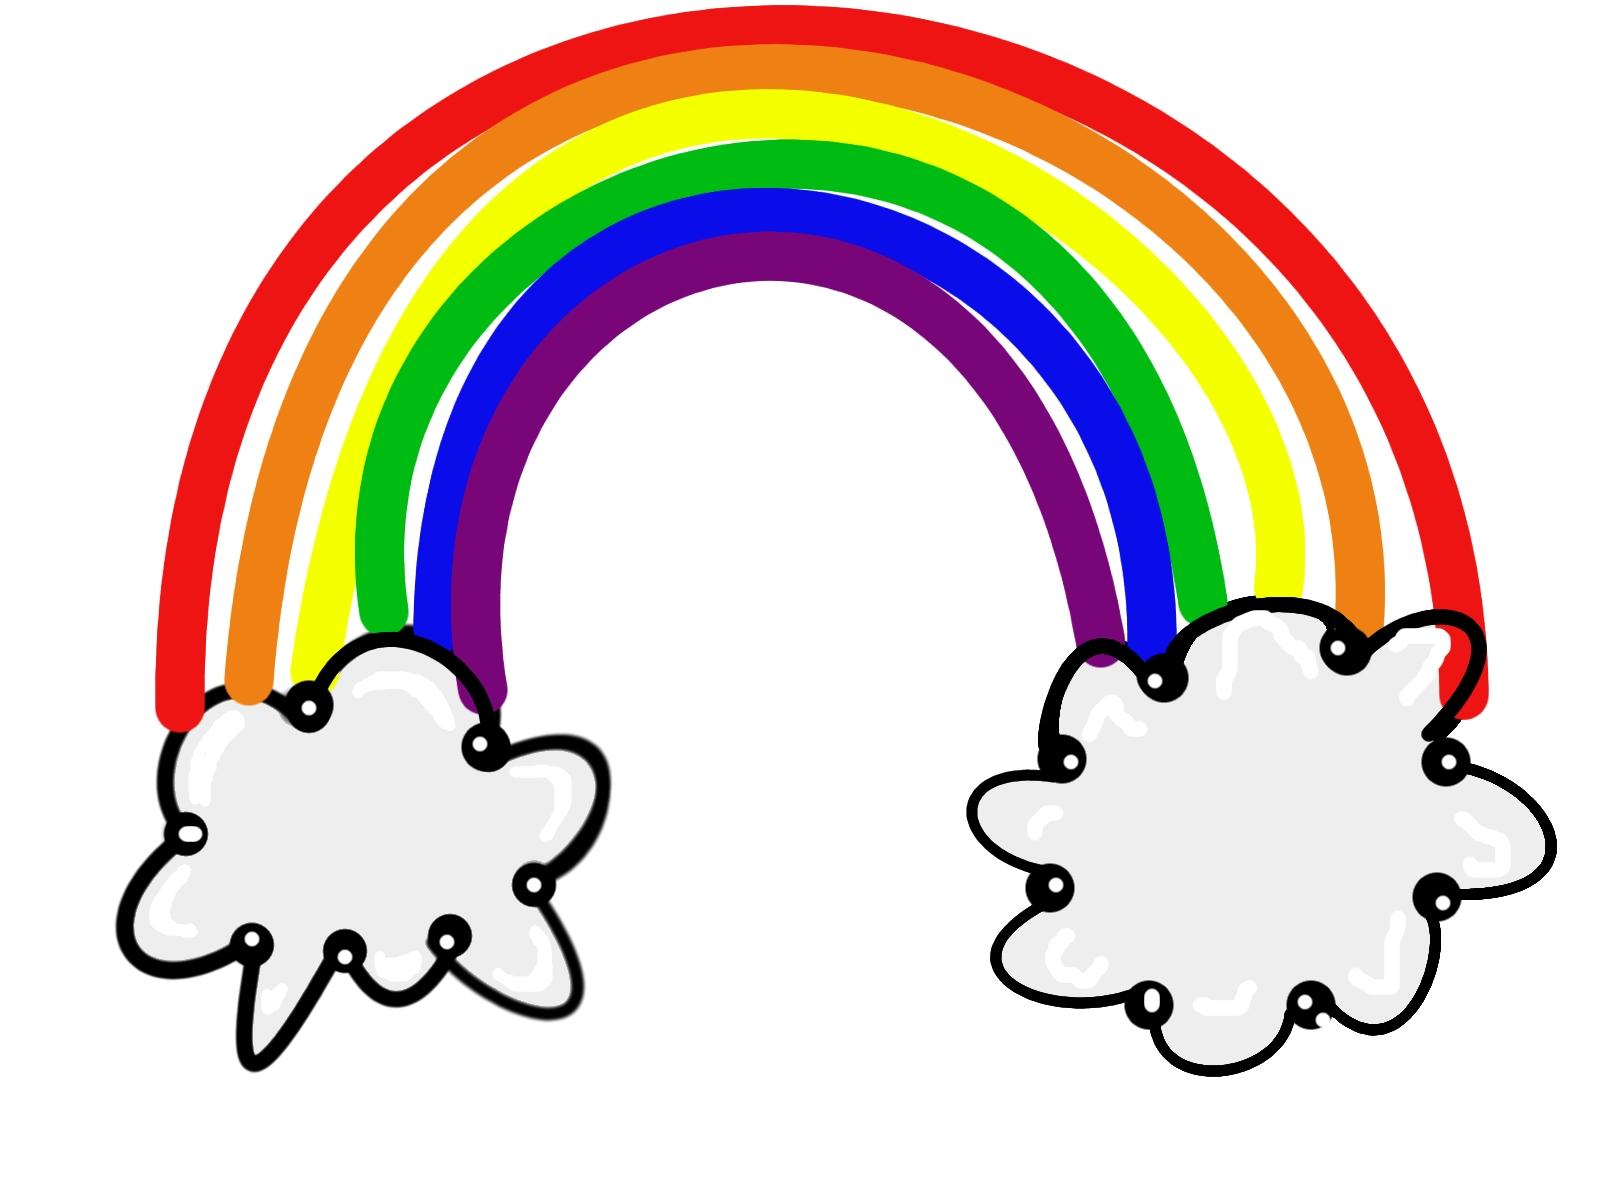 3 clipart rainbow. Unique design digital collection